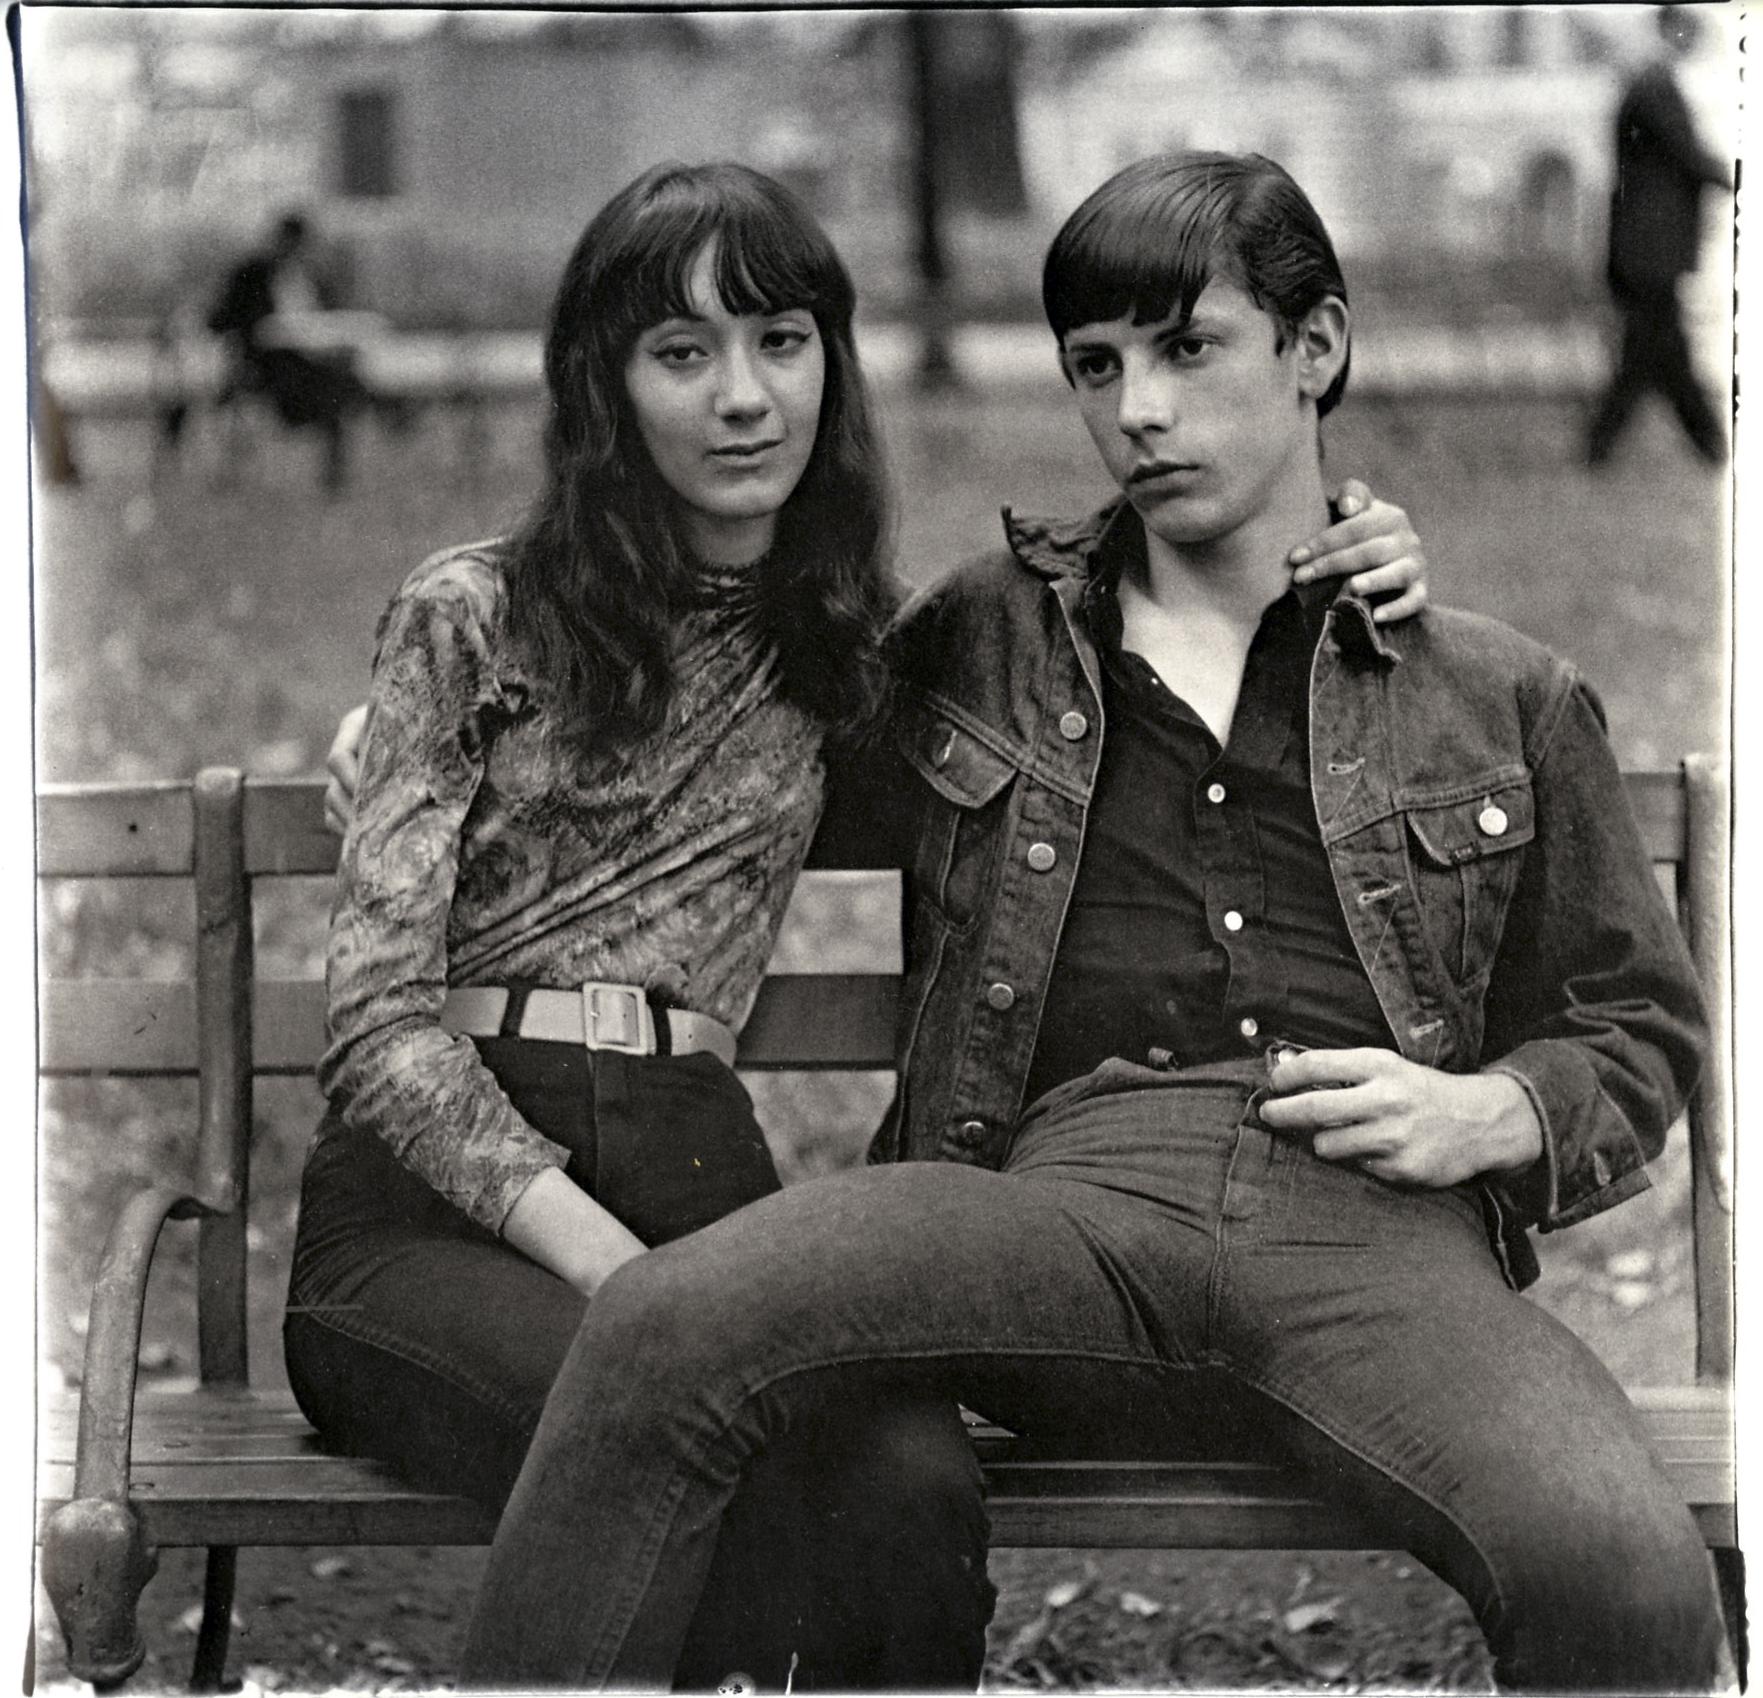 Diane-ArbusNew-York-1965